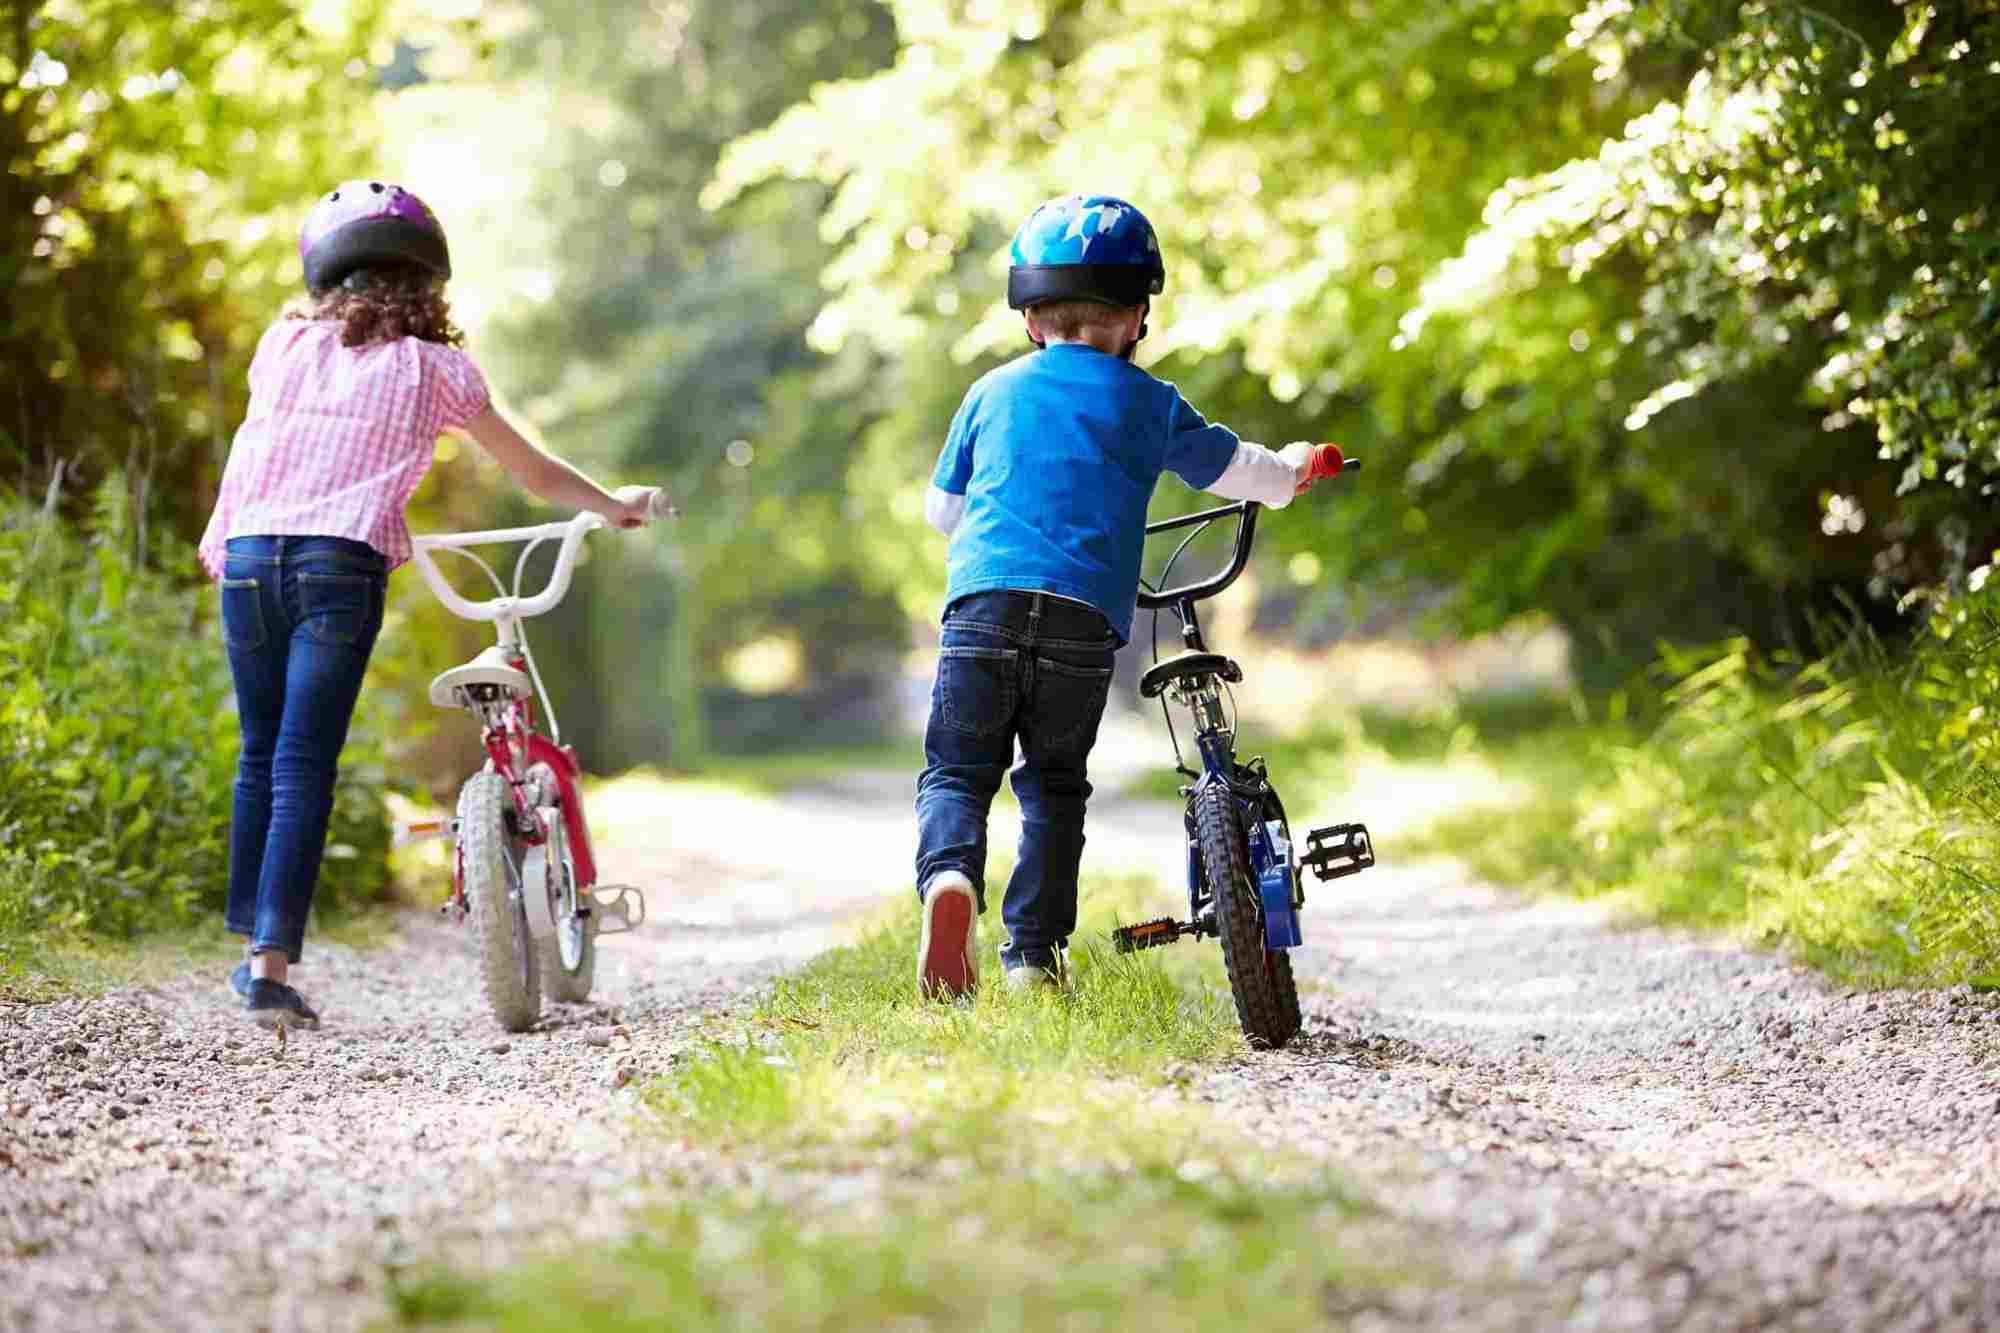 children in helmets pushing bikes along a path